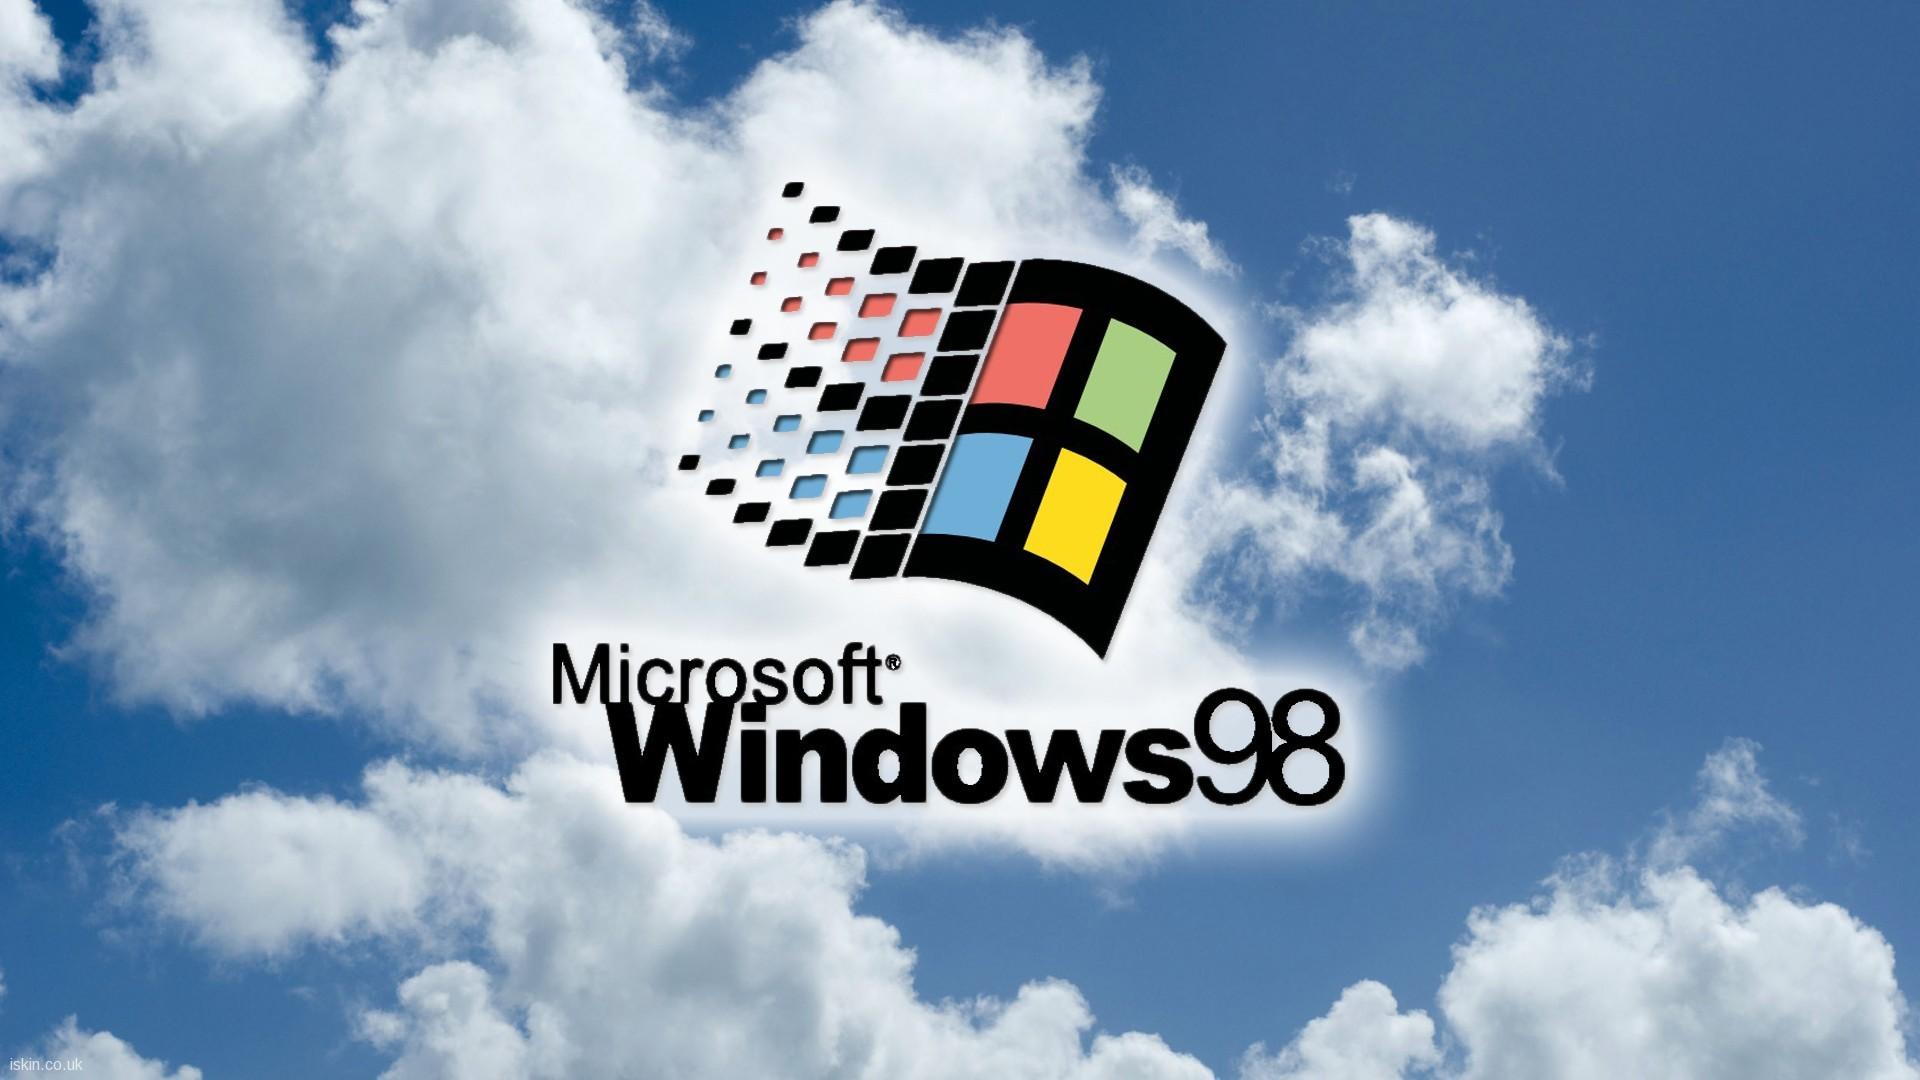 Windows 98 Logo wallpaper – 626438